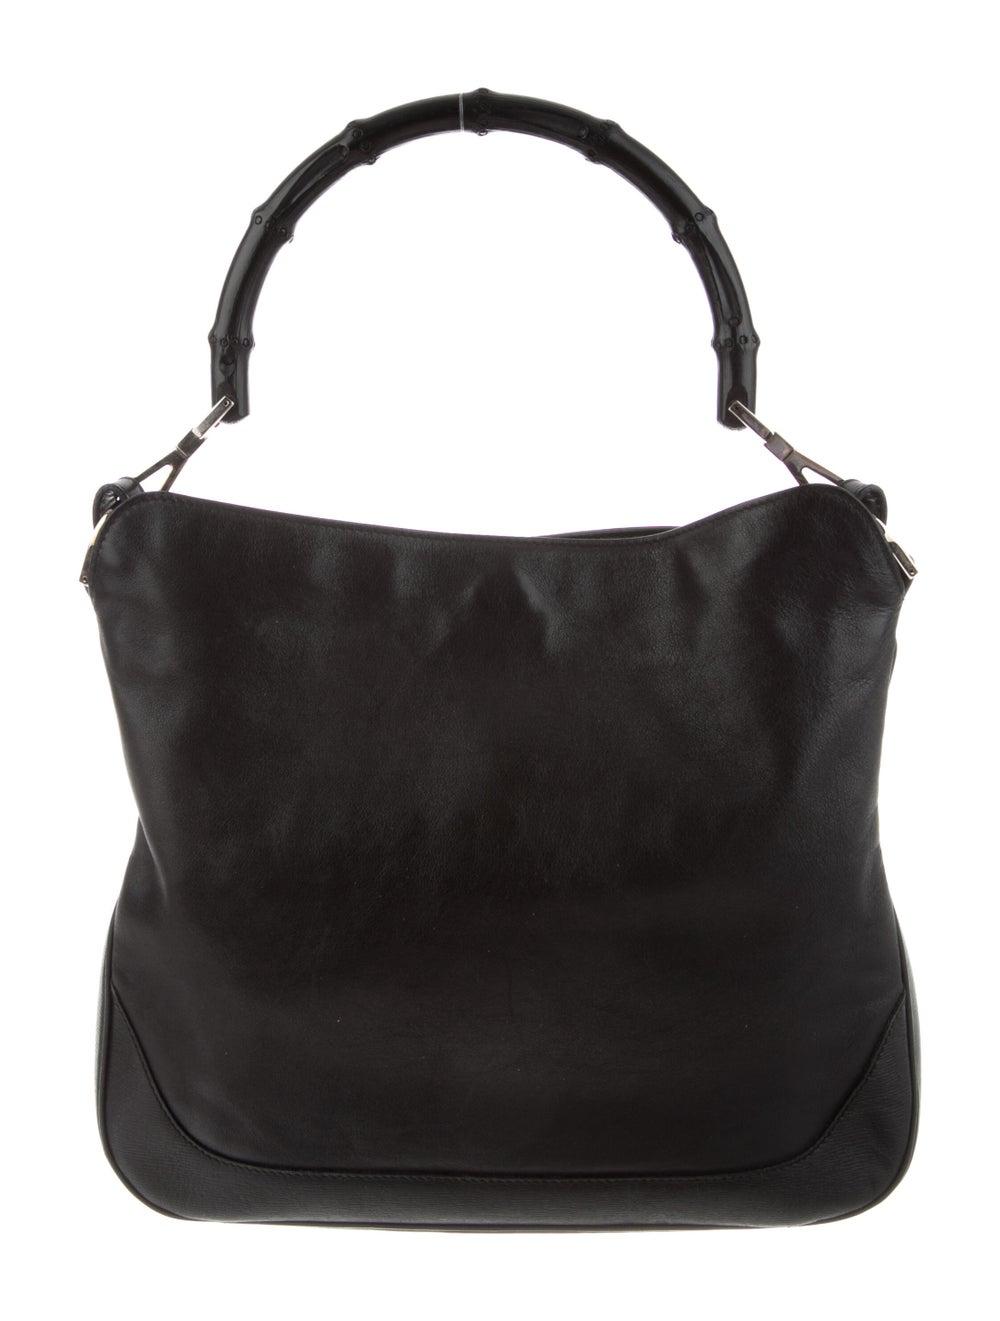 Gucci Vintage Leather Bamboo Handle Bag Black - image 4